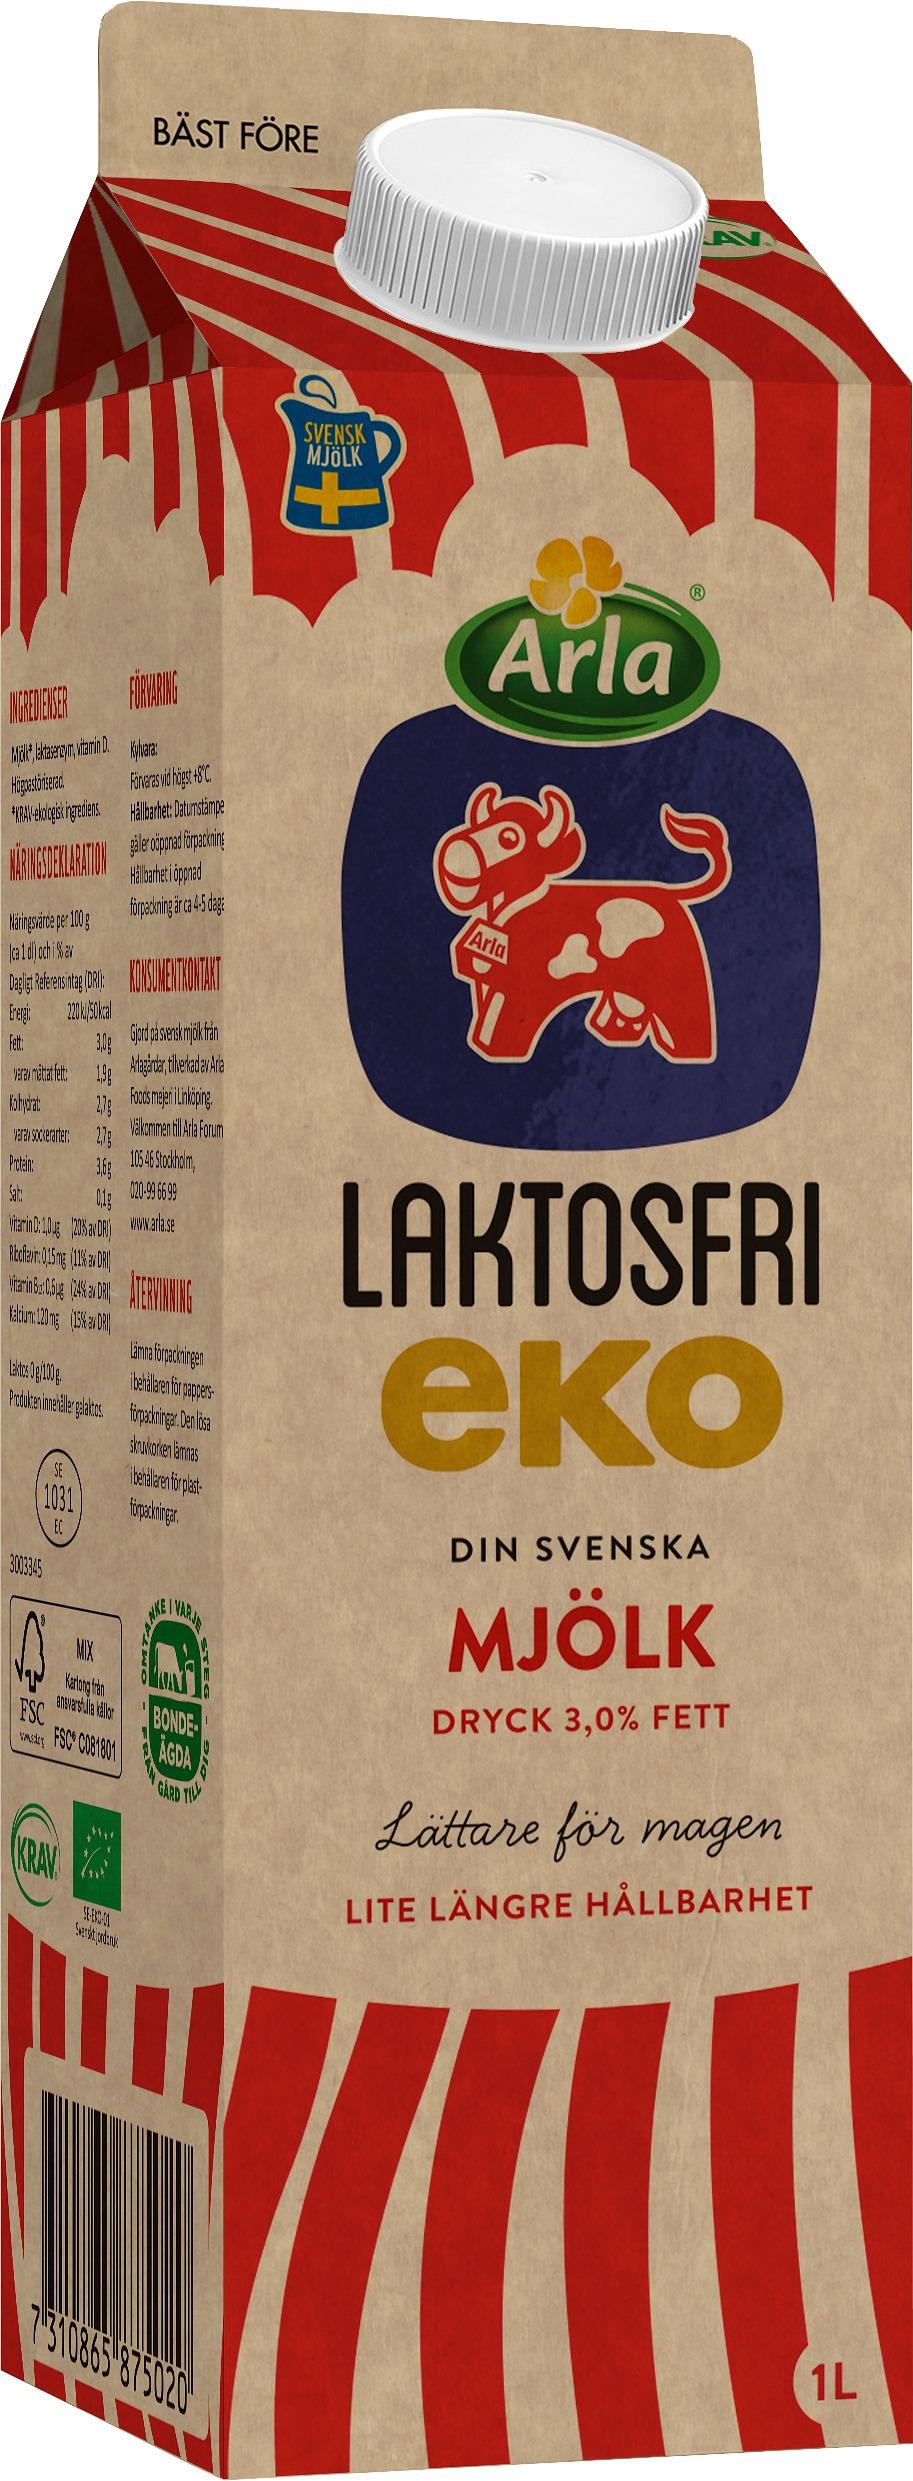 Laktosfri Ekologisk Mjölkdryck 3,0%